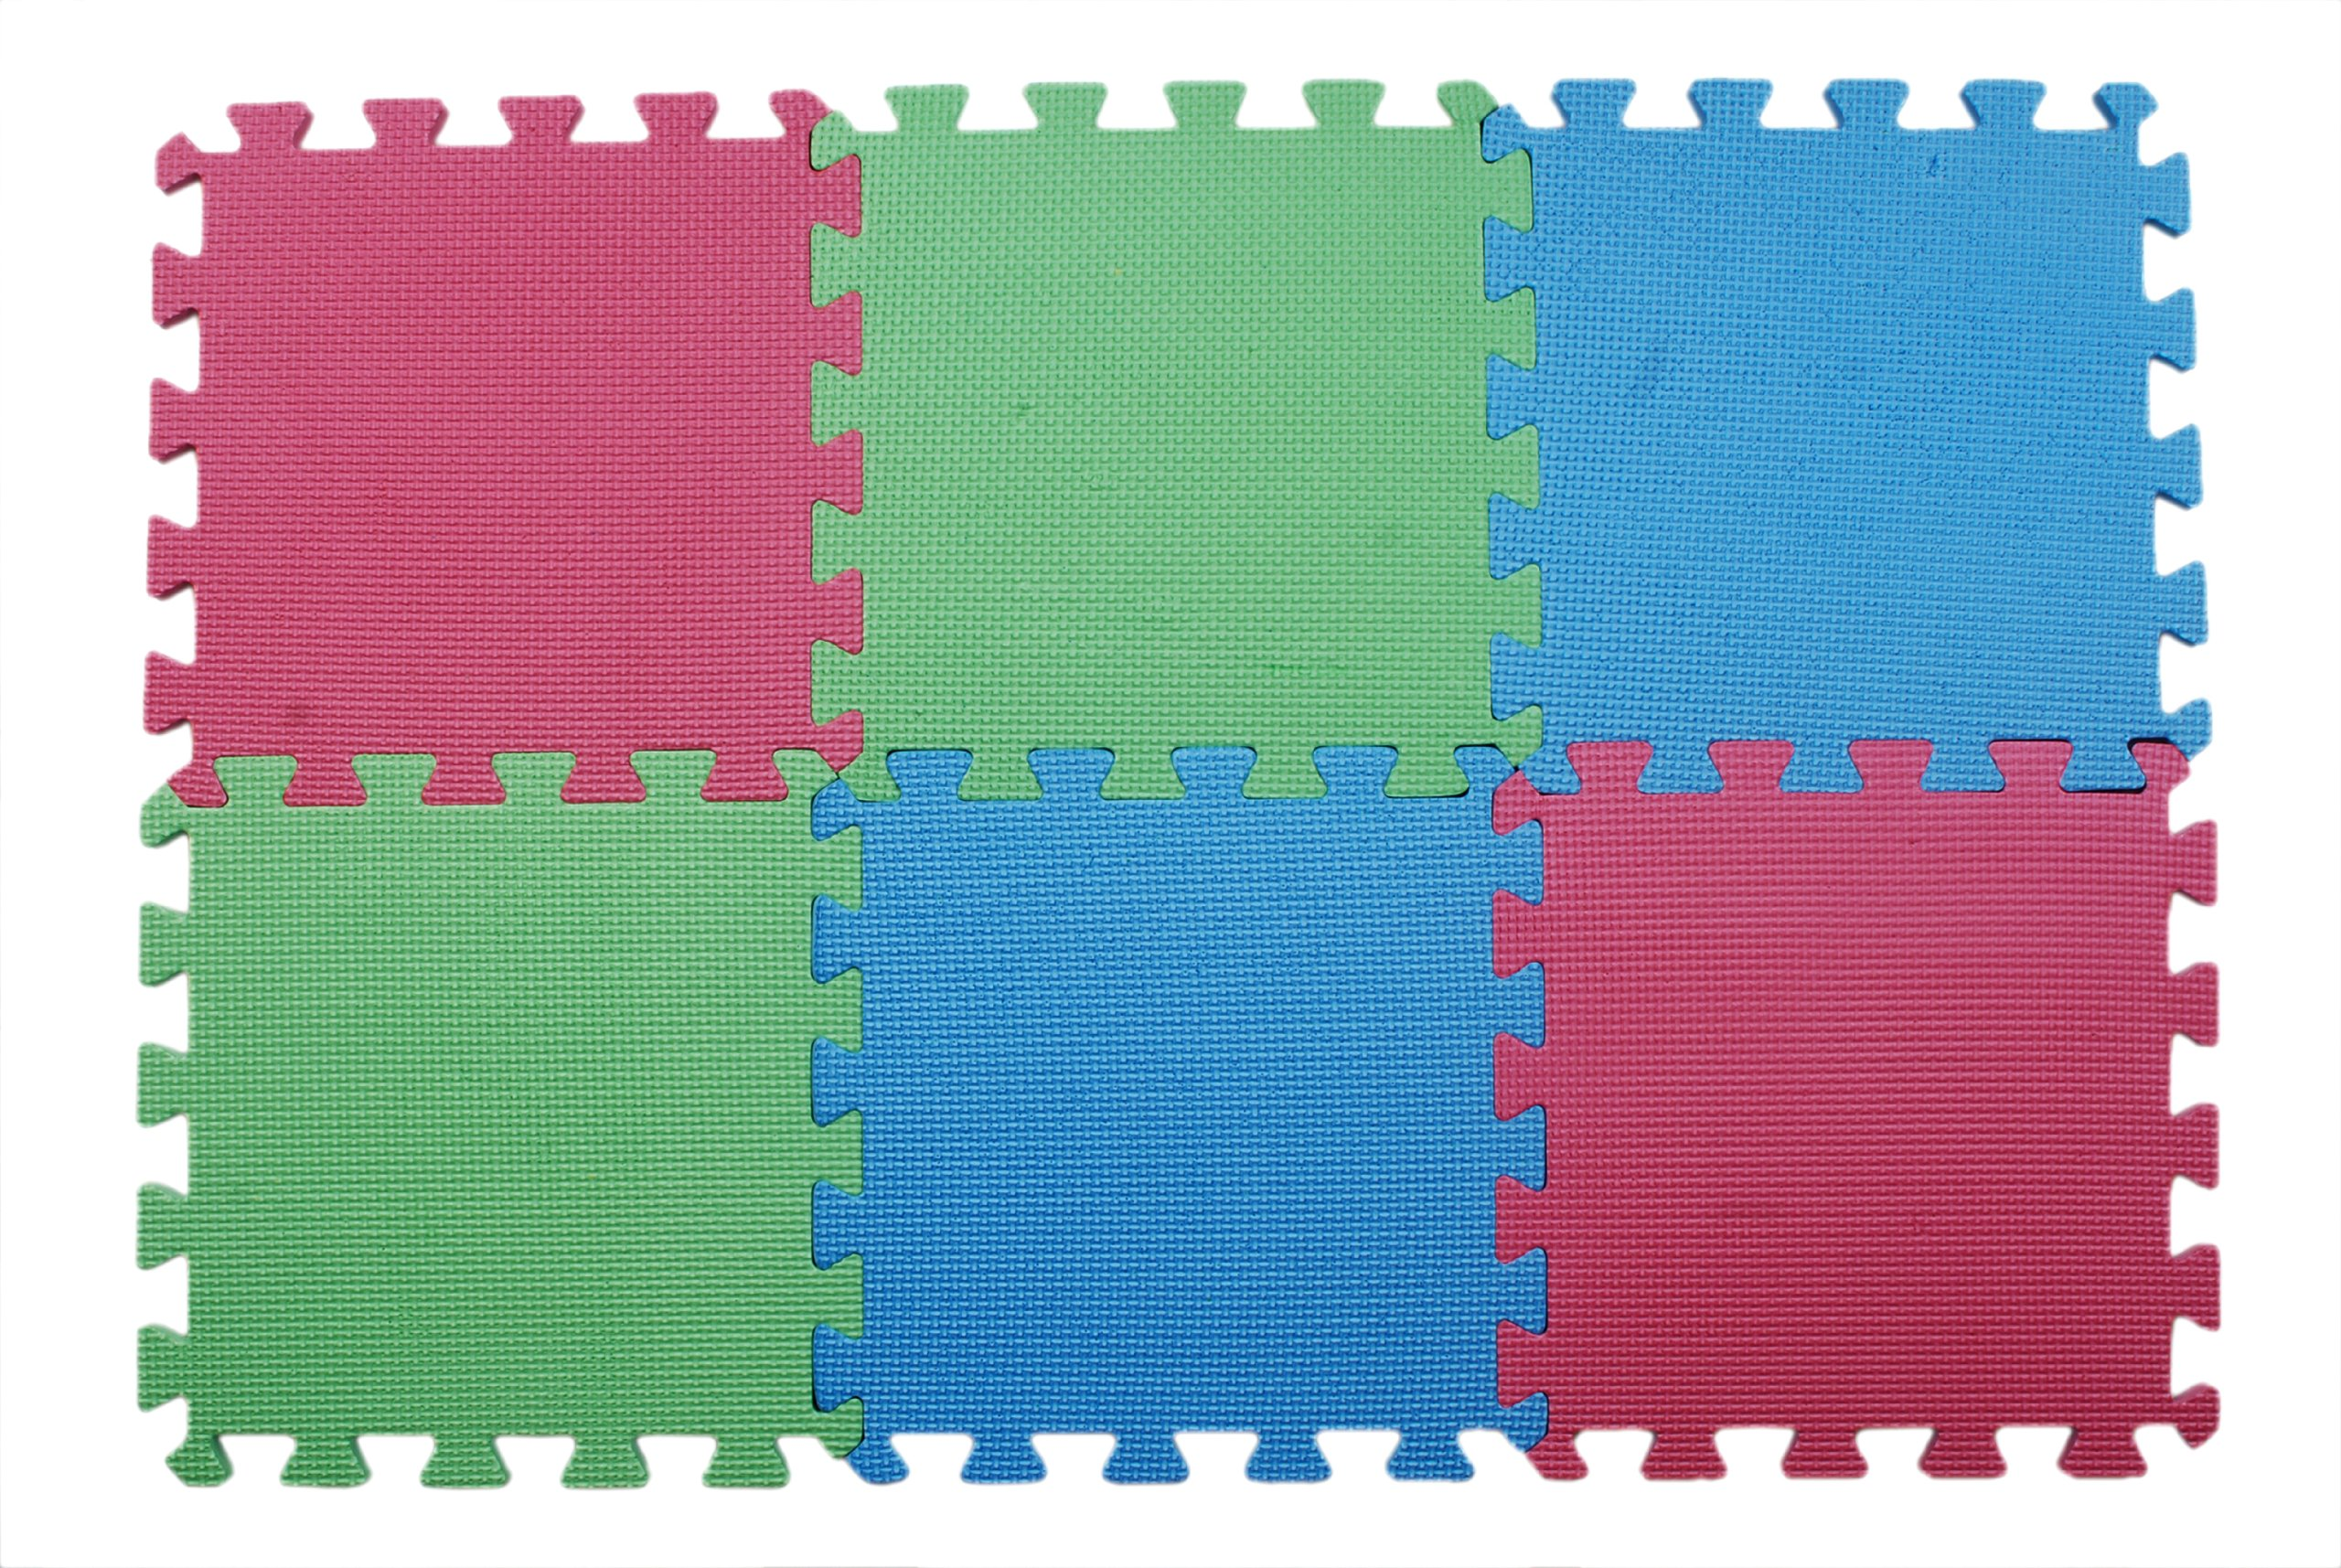 Knit Pro KP10874 | Foam Rubber Lace Blocking Mats | 12 x 12in | 9 pack